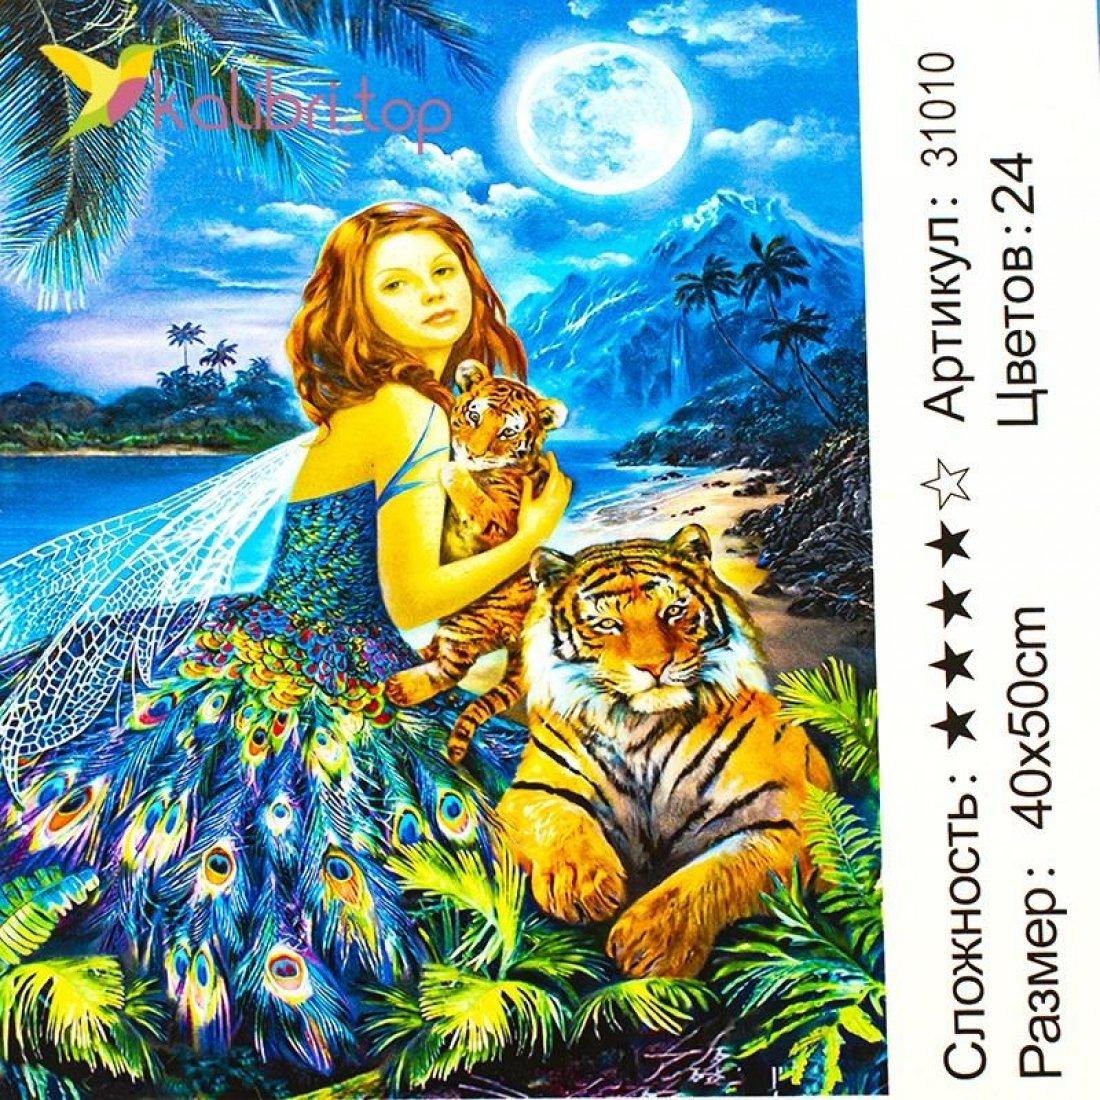 Рисования по номерам Фея с тиграми 40*50 см оптом фото 17